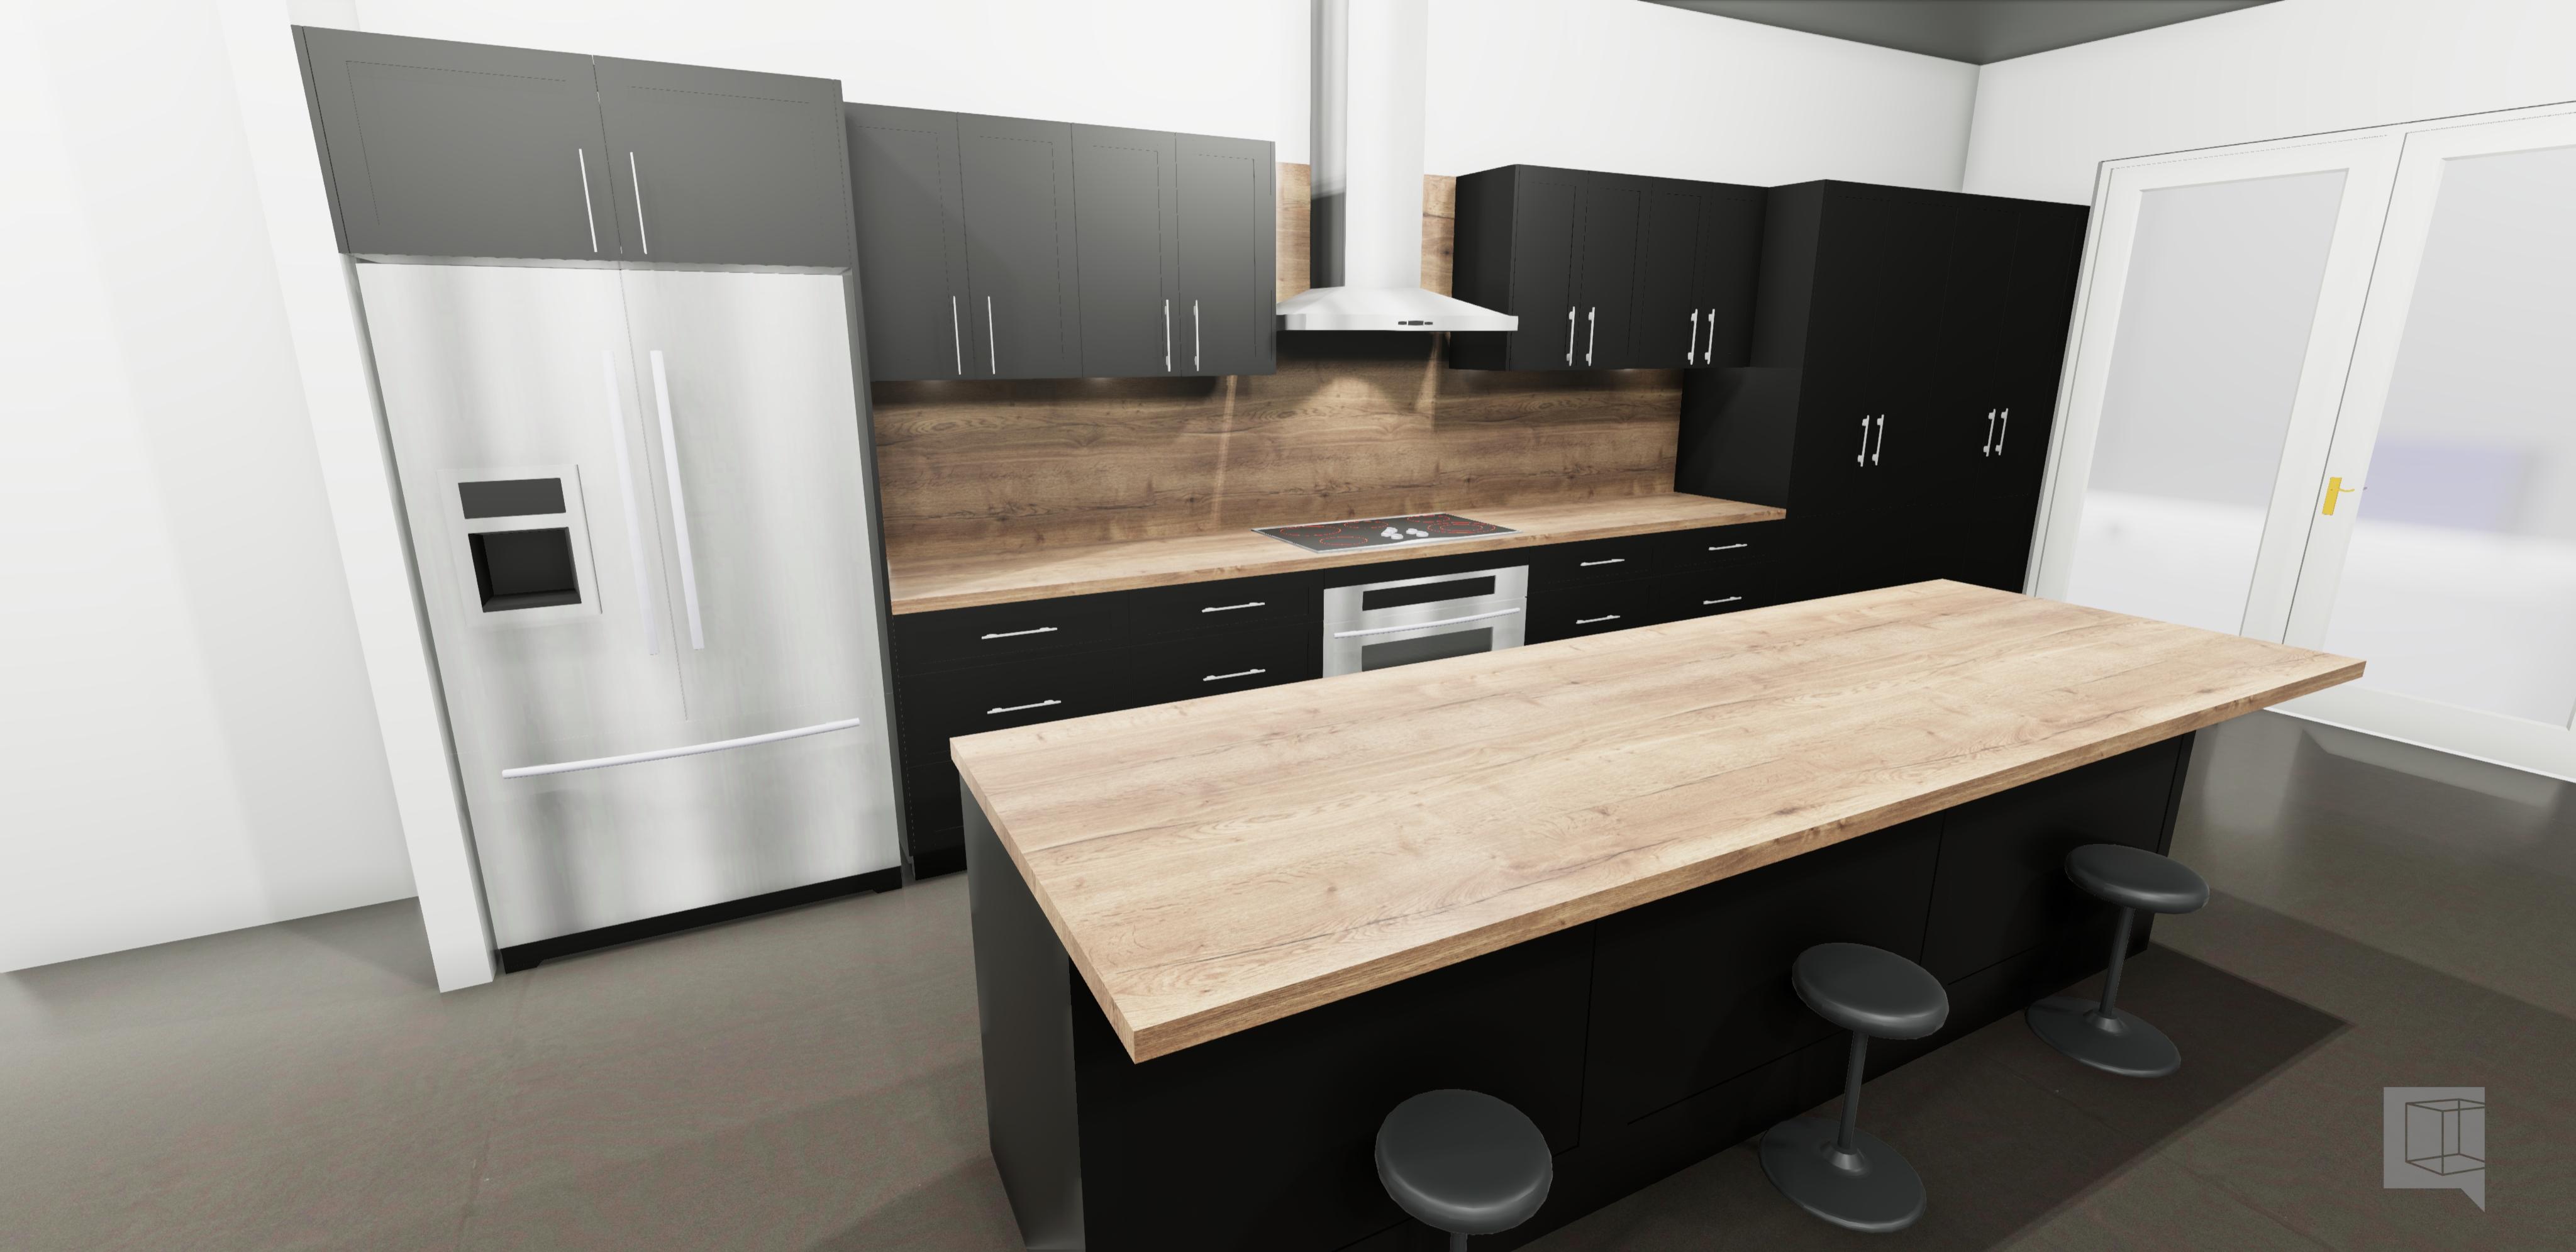 Booth Furniture_design (9).jpg